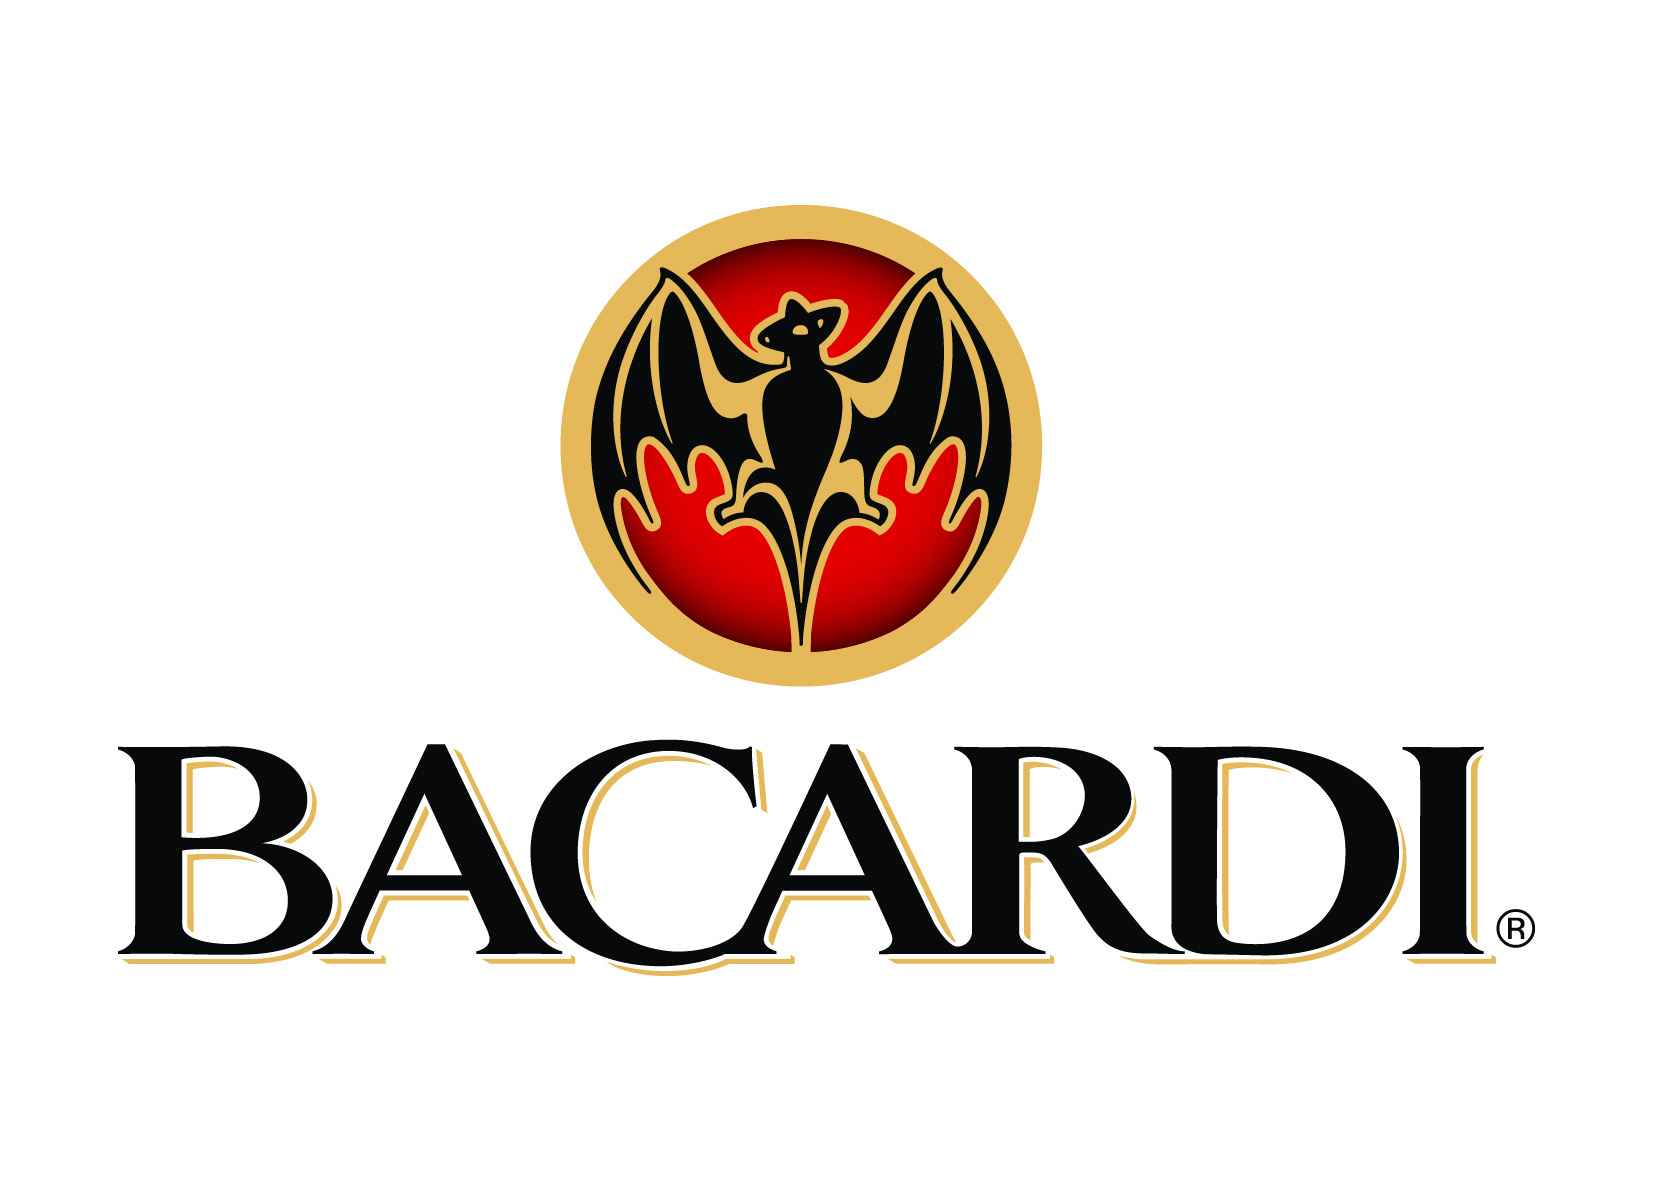 250811 Bacardi logo